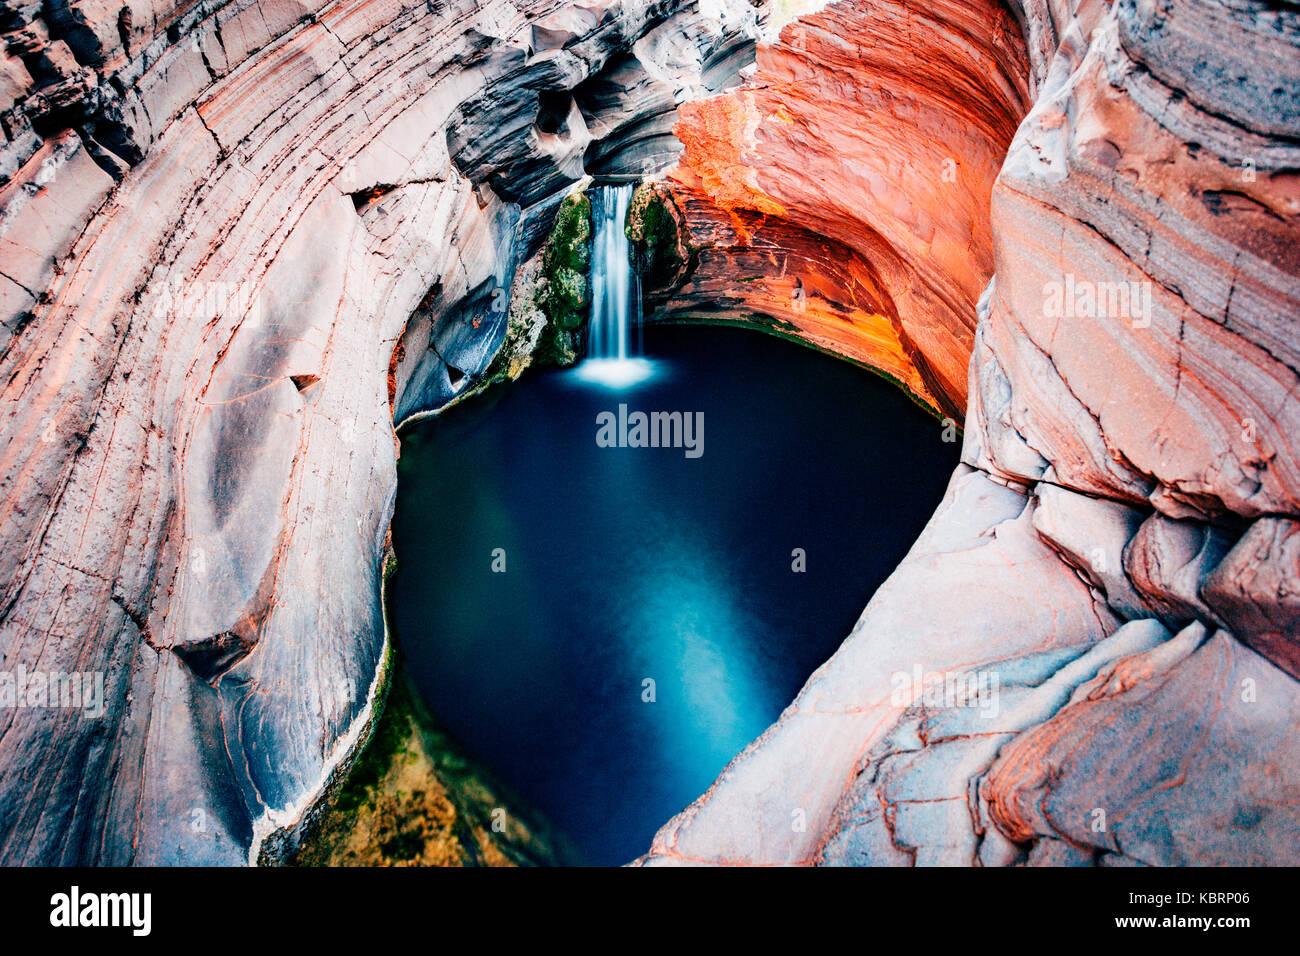 Hamersley Gorge, Spa Pool, Karijini National Park, North West, Western Australia Stock Photo